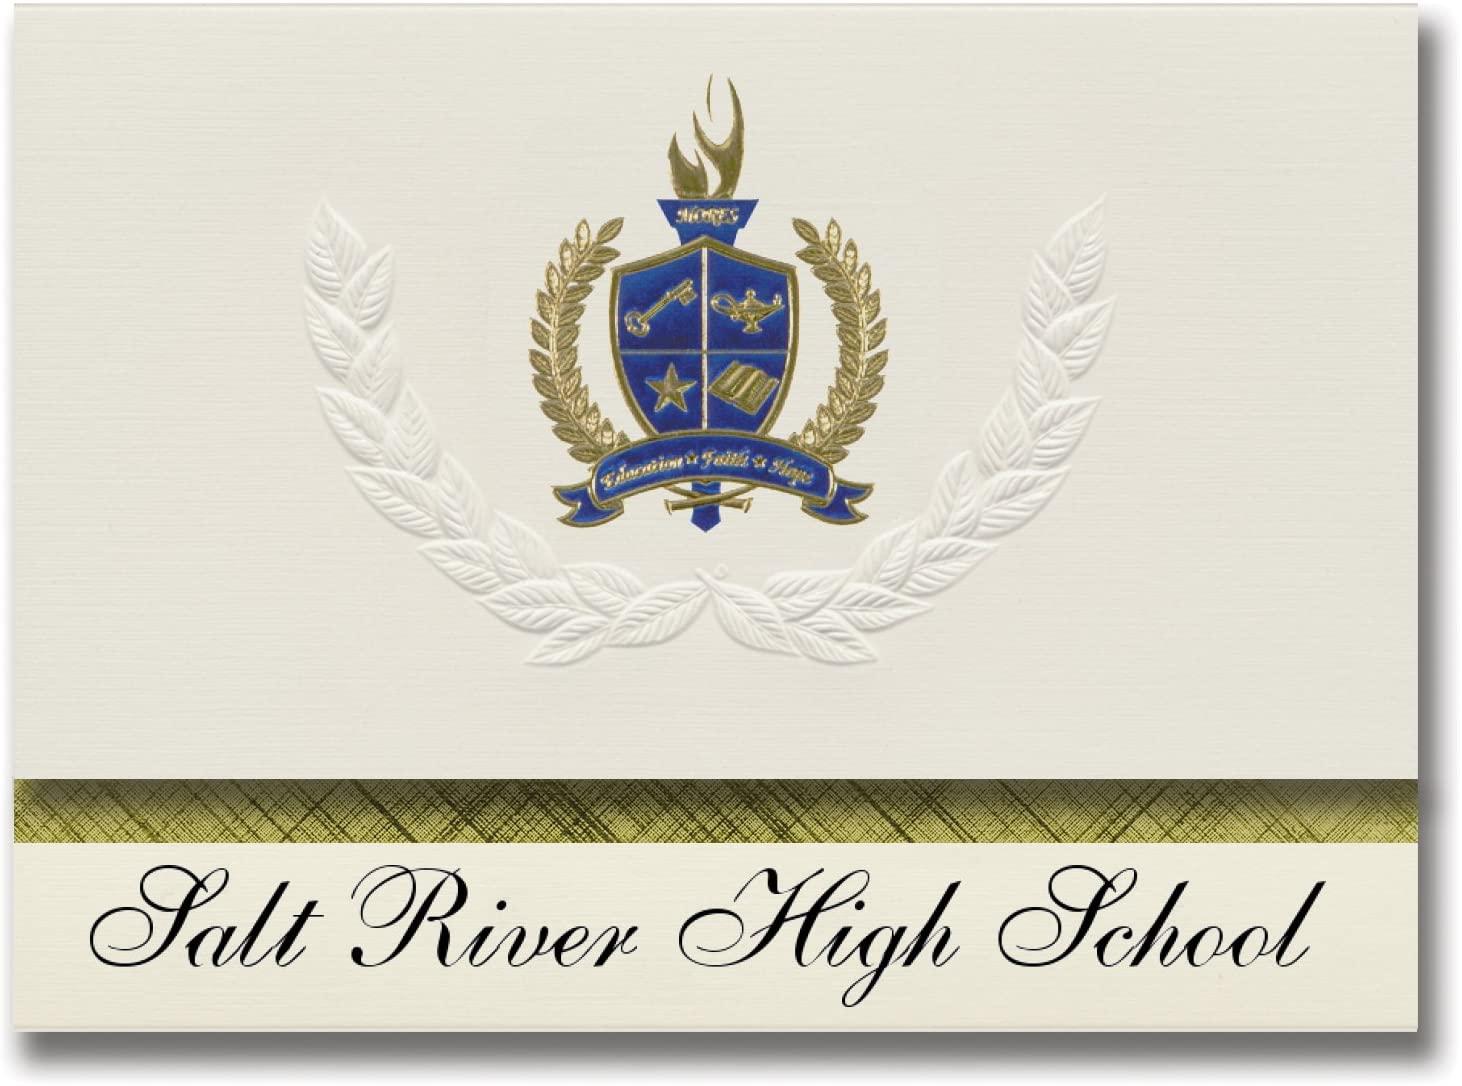 Signature Announcements Salt River High School (Scottsdale, AZ) Graduation Announcements, Presidential style, Elite package of 25 with Gold & Blue Metallic Foil seal